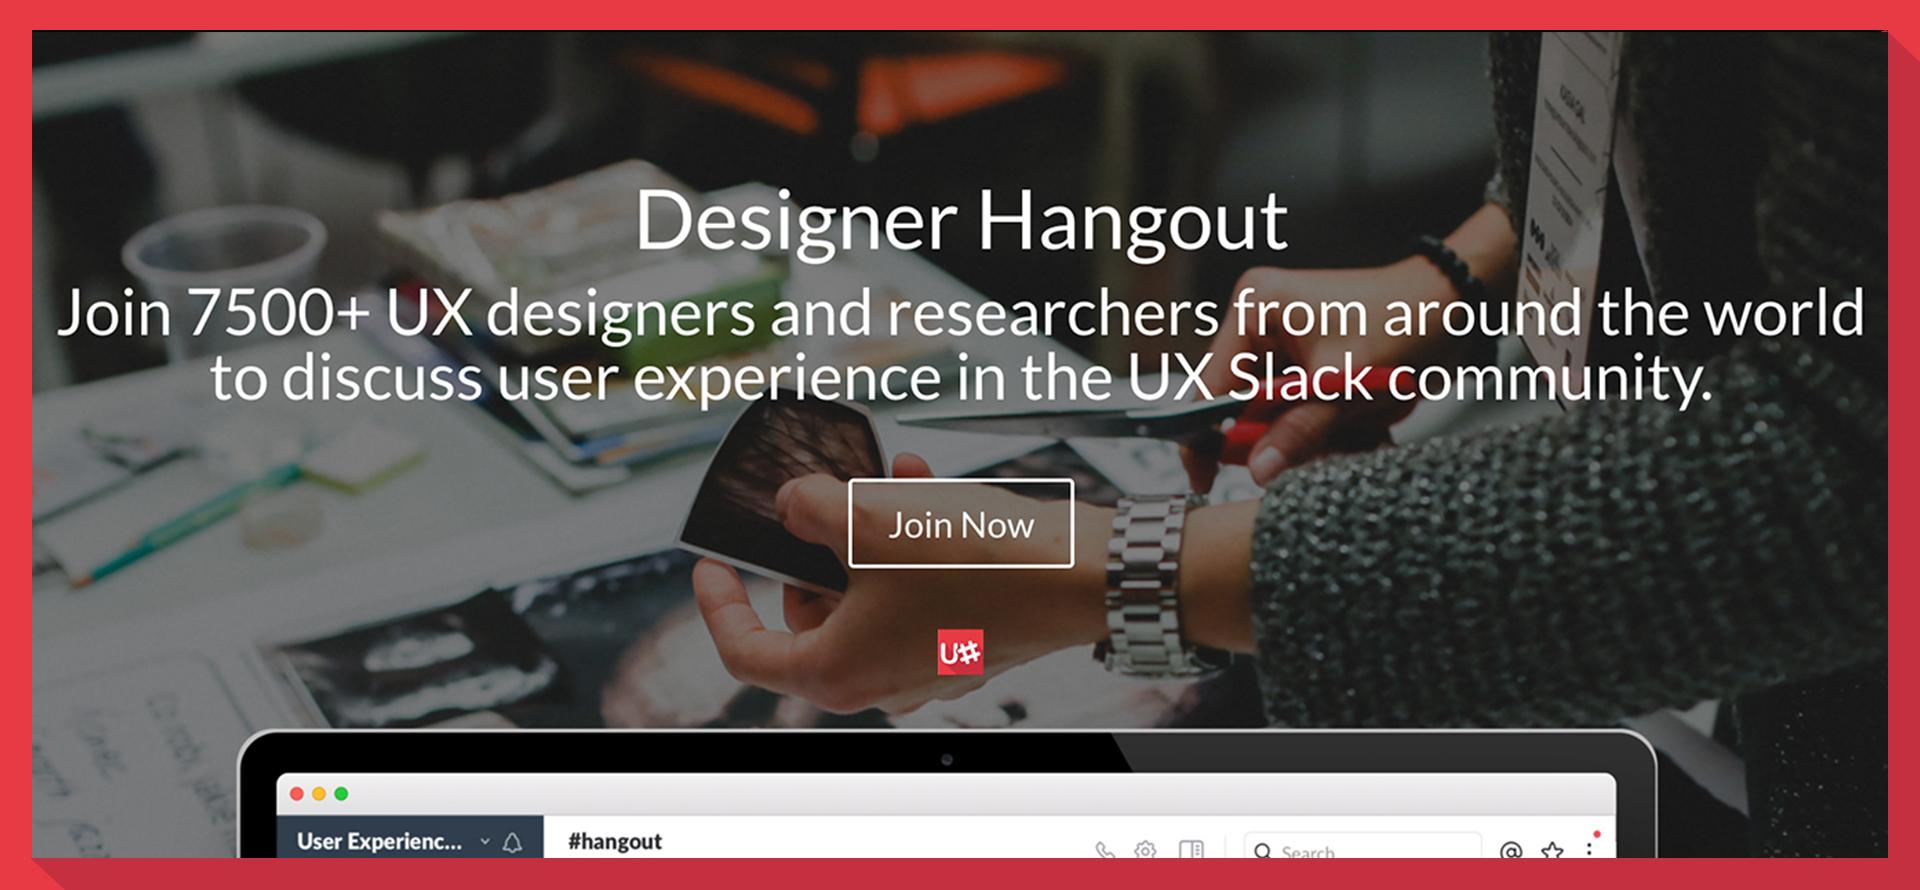 DesignerHangout